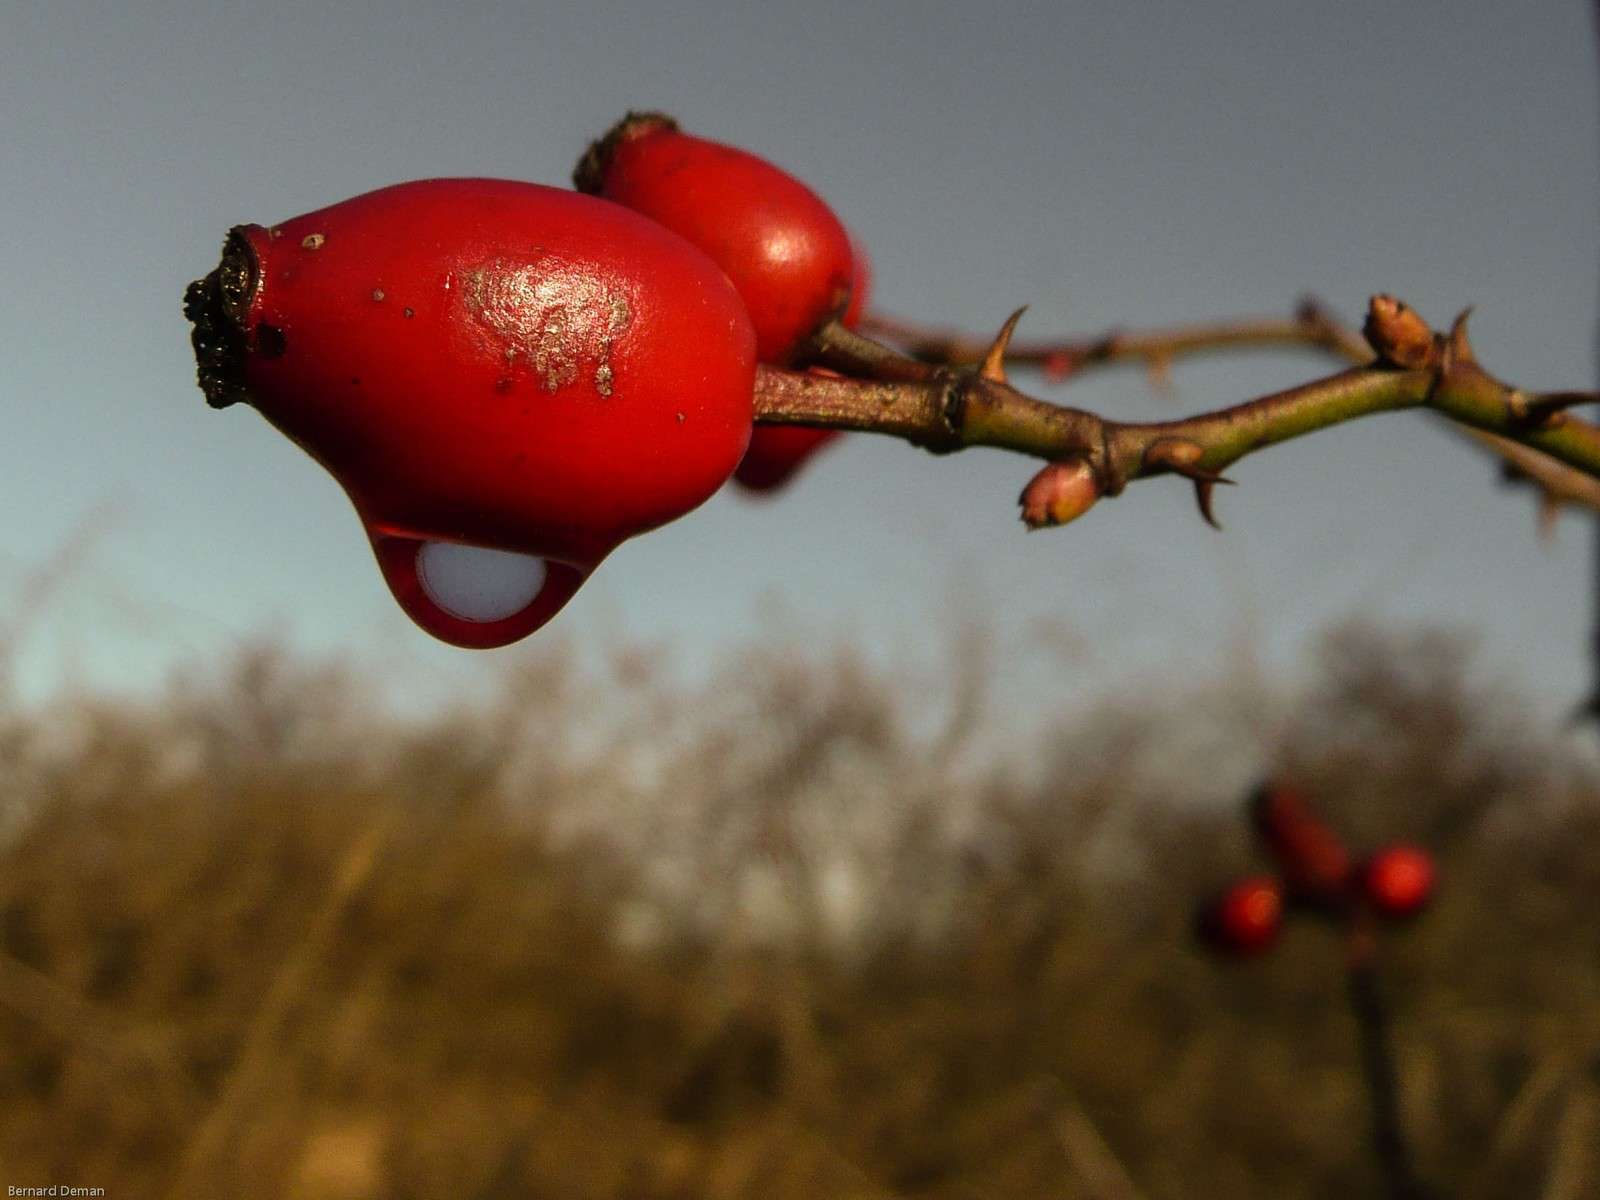 Eglantier - fruit (crédit : Bernard Deman)